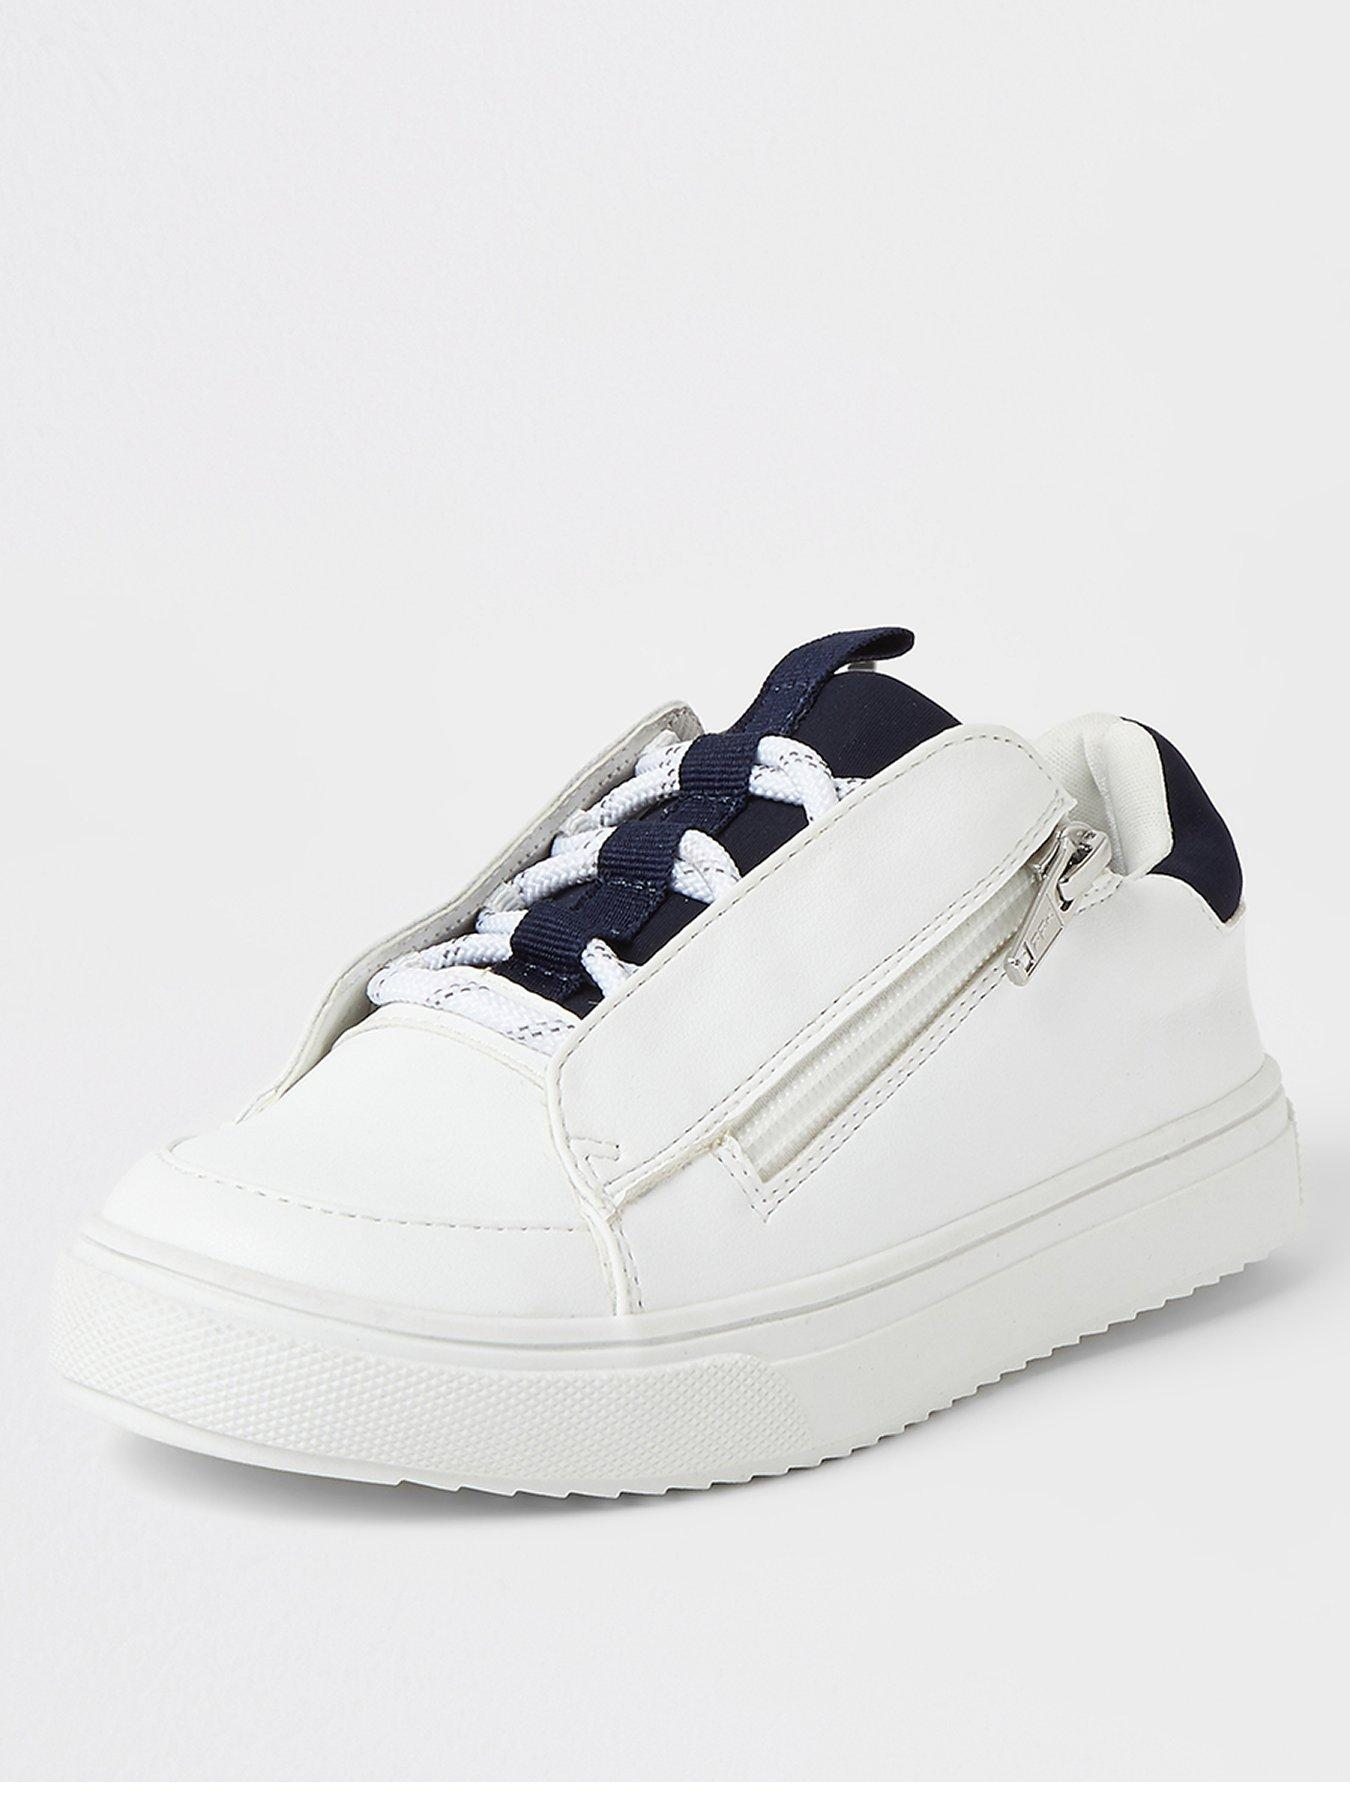 River island   Kids \u0026 baby sports shoes